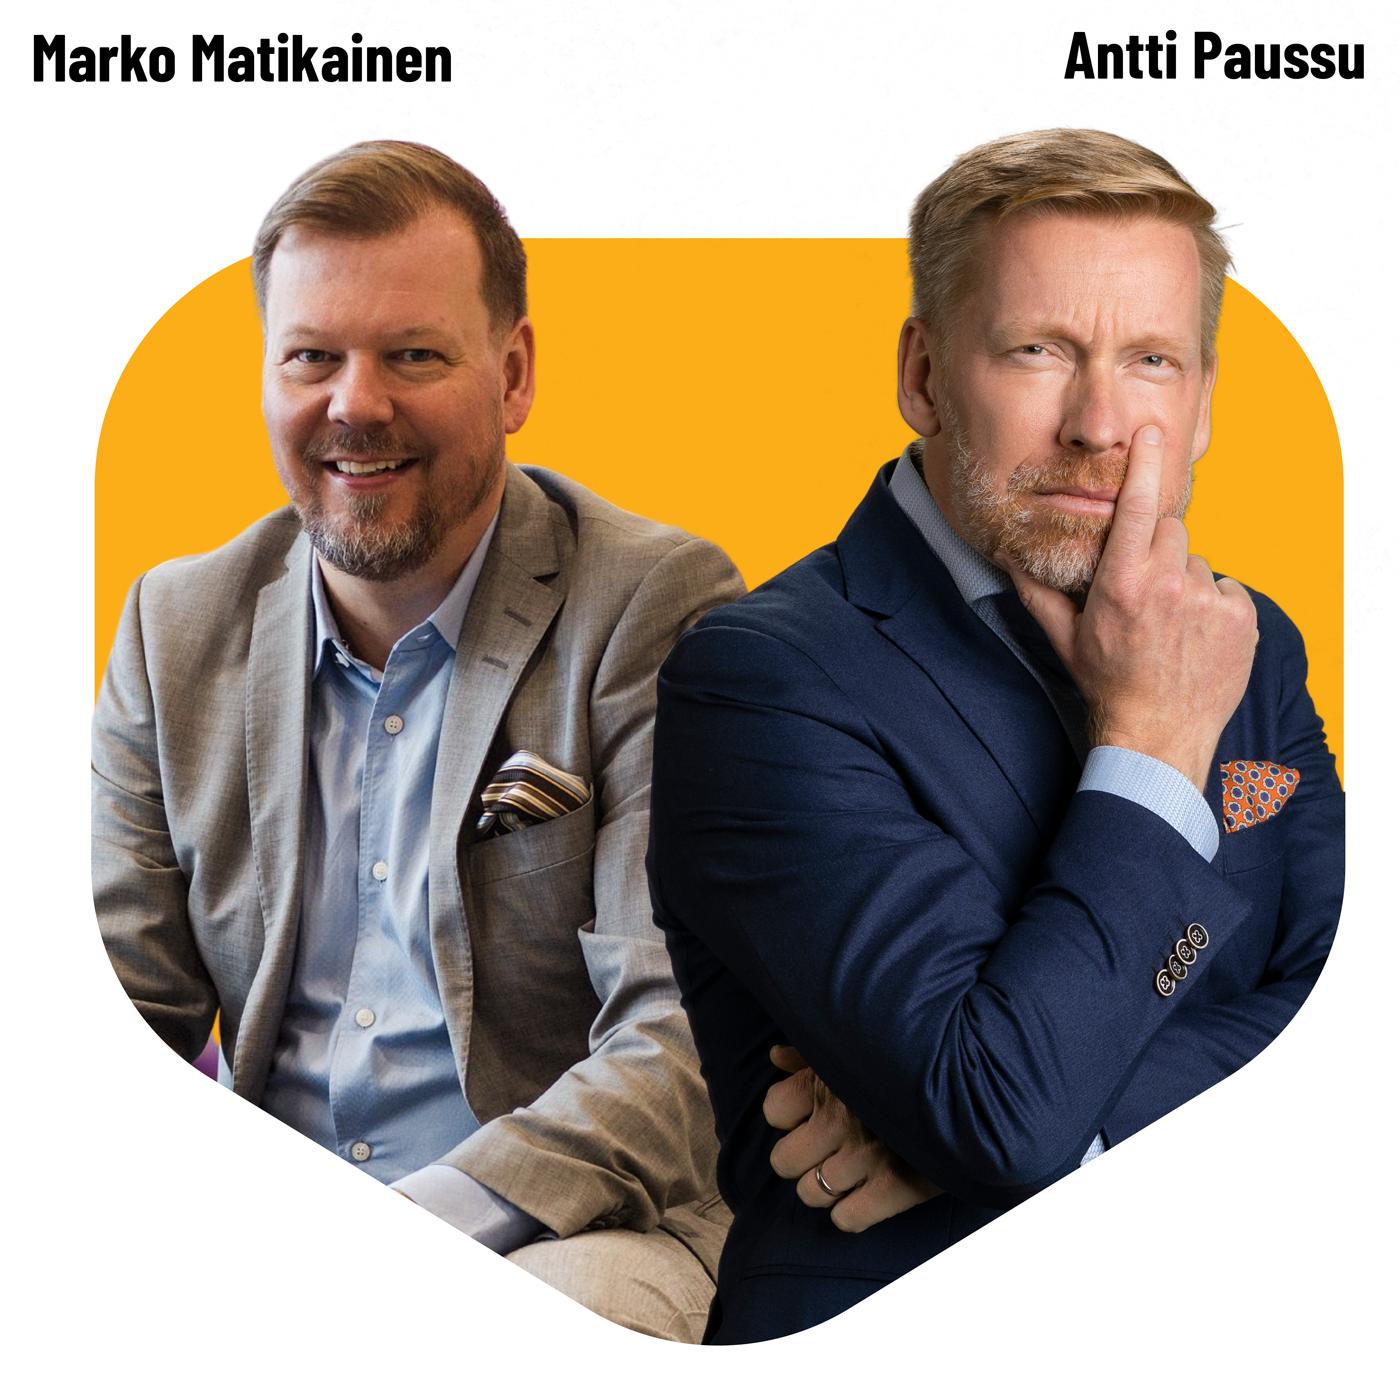 myyntityo-koronan-jalkeen-webinaari-mika-myyttuu-kasvu-partners